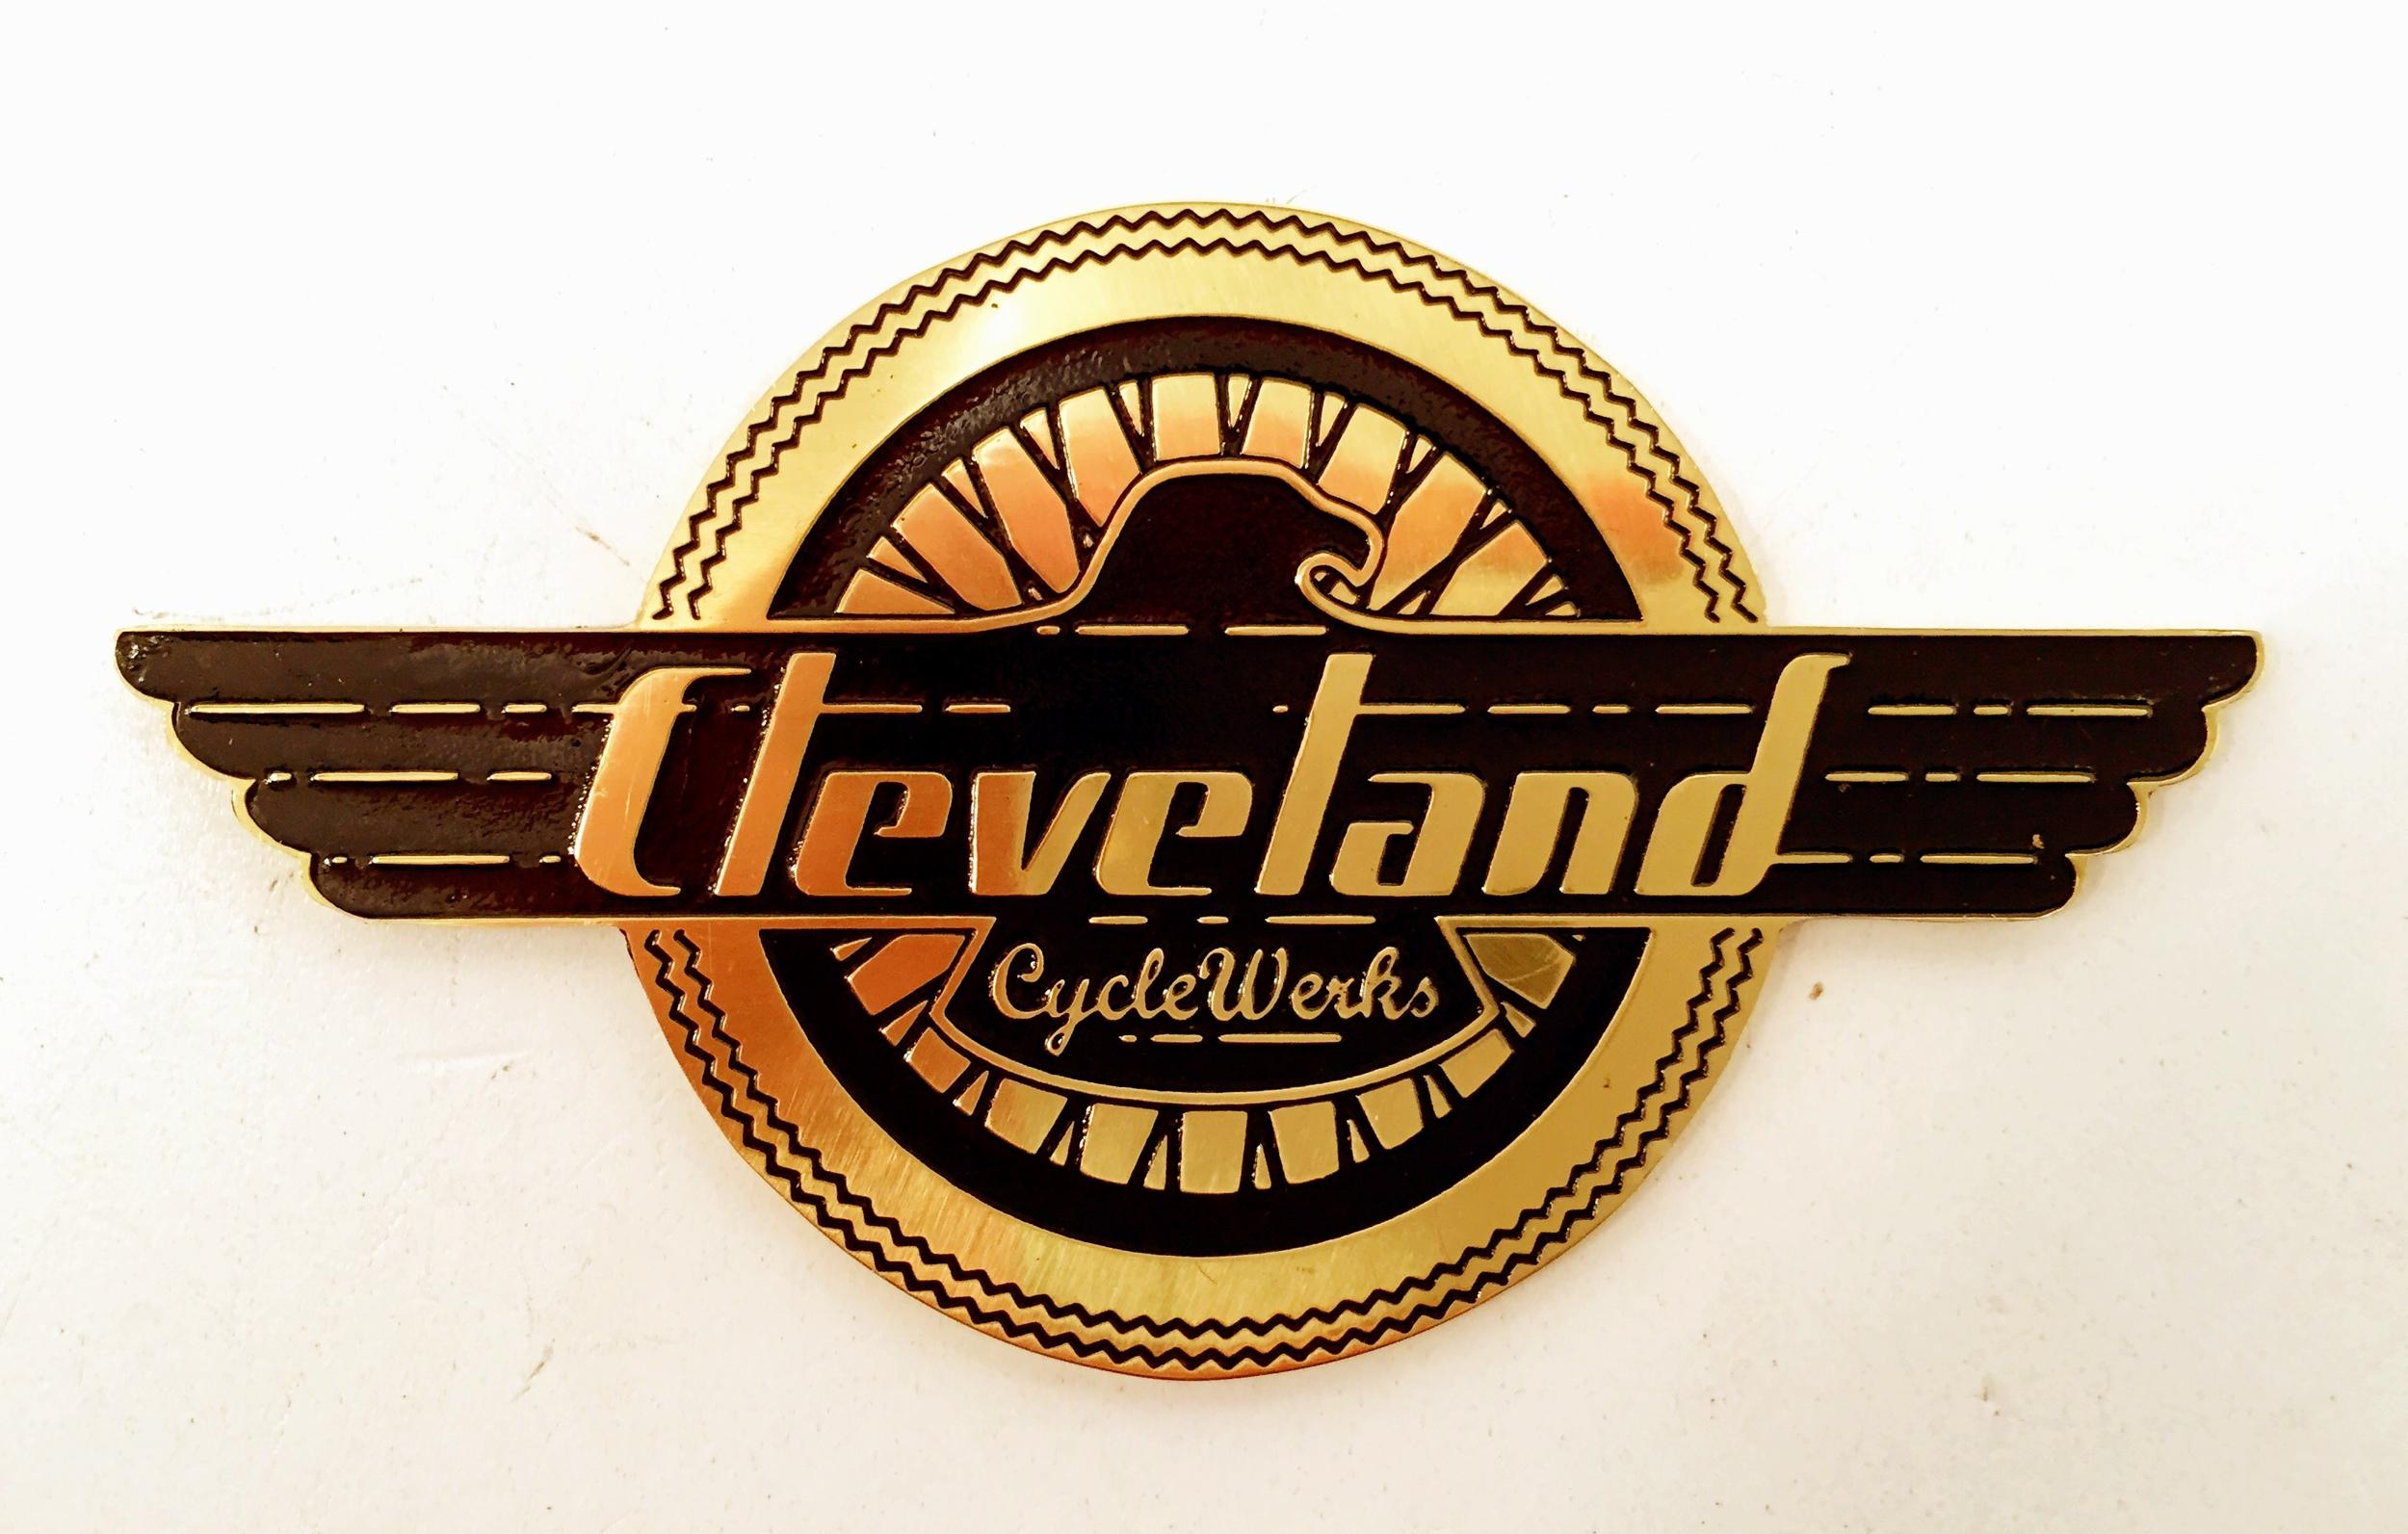 Cleveland CycleWerks Badge